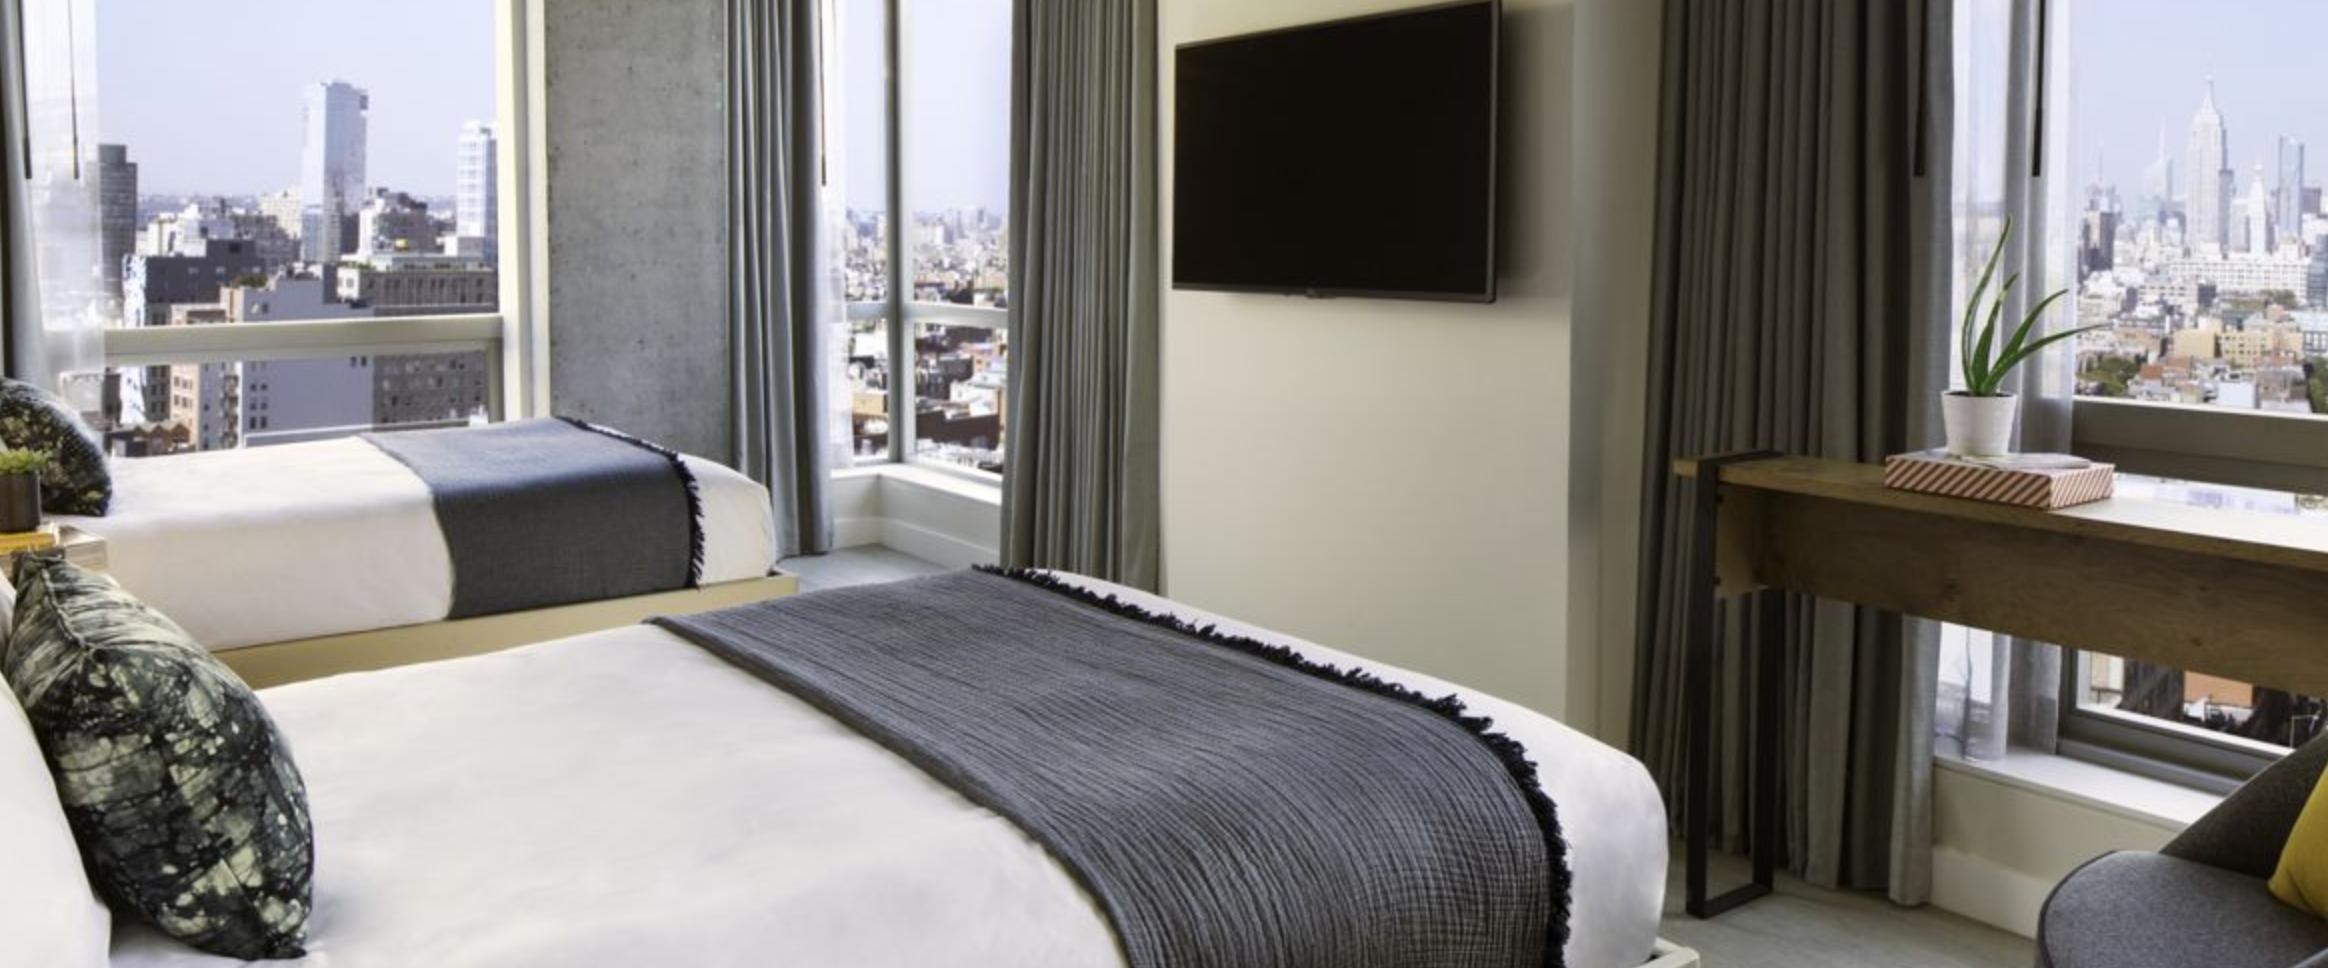 https://www.hotelsbyday.com/_data/default-hotel_image/4/21944/screenshot-2020-09-20-at-5-55-24-pm.png